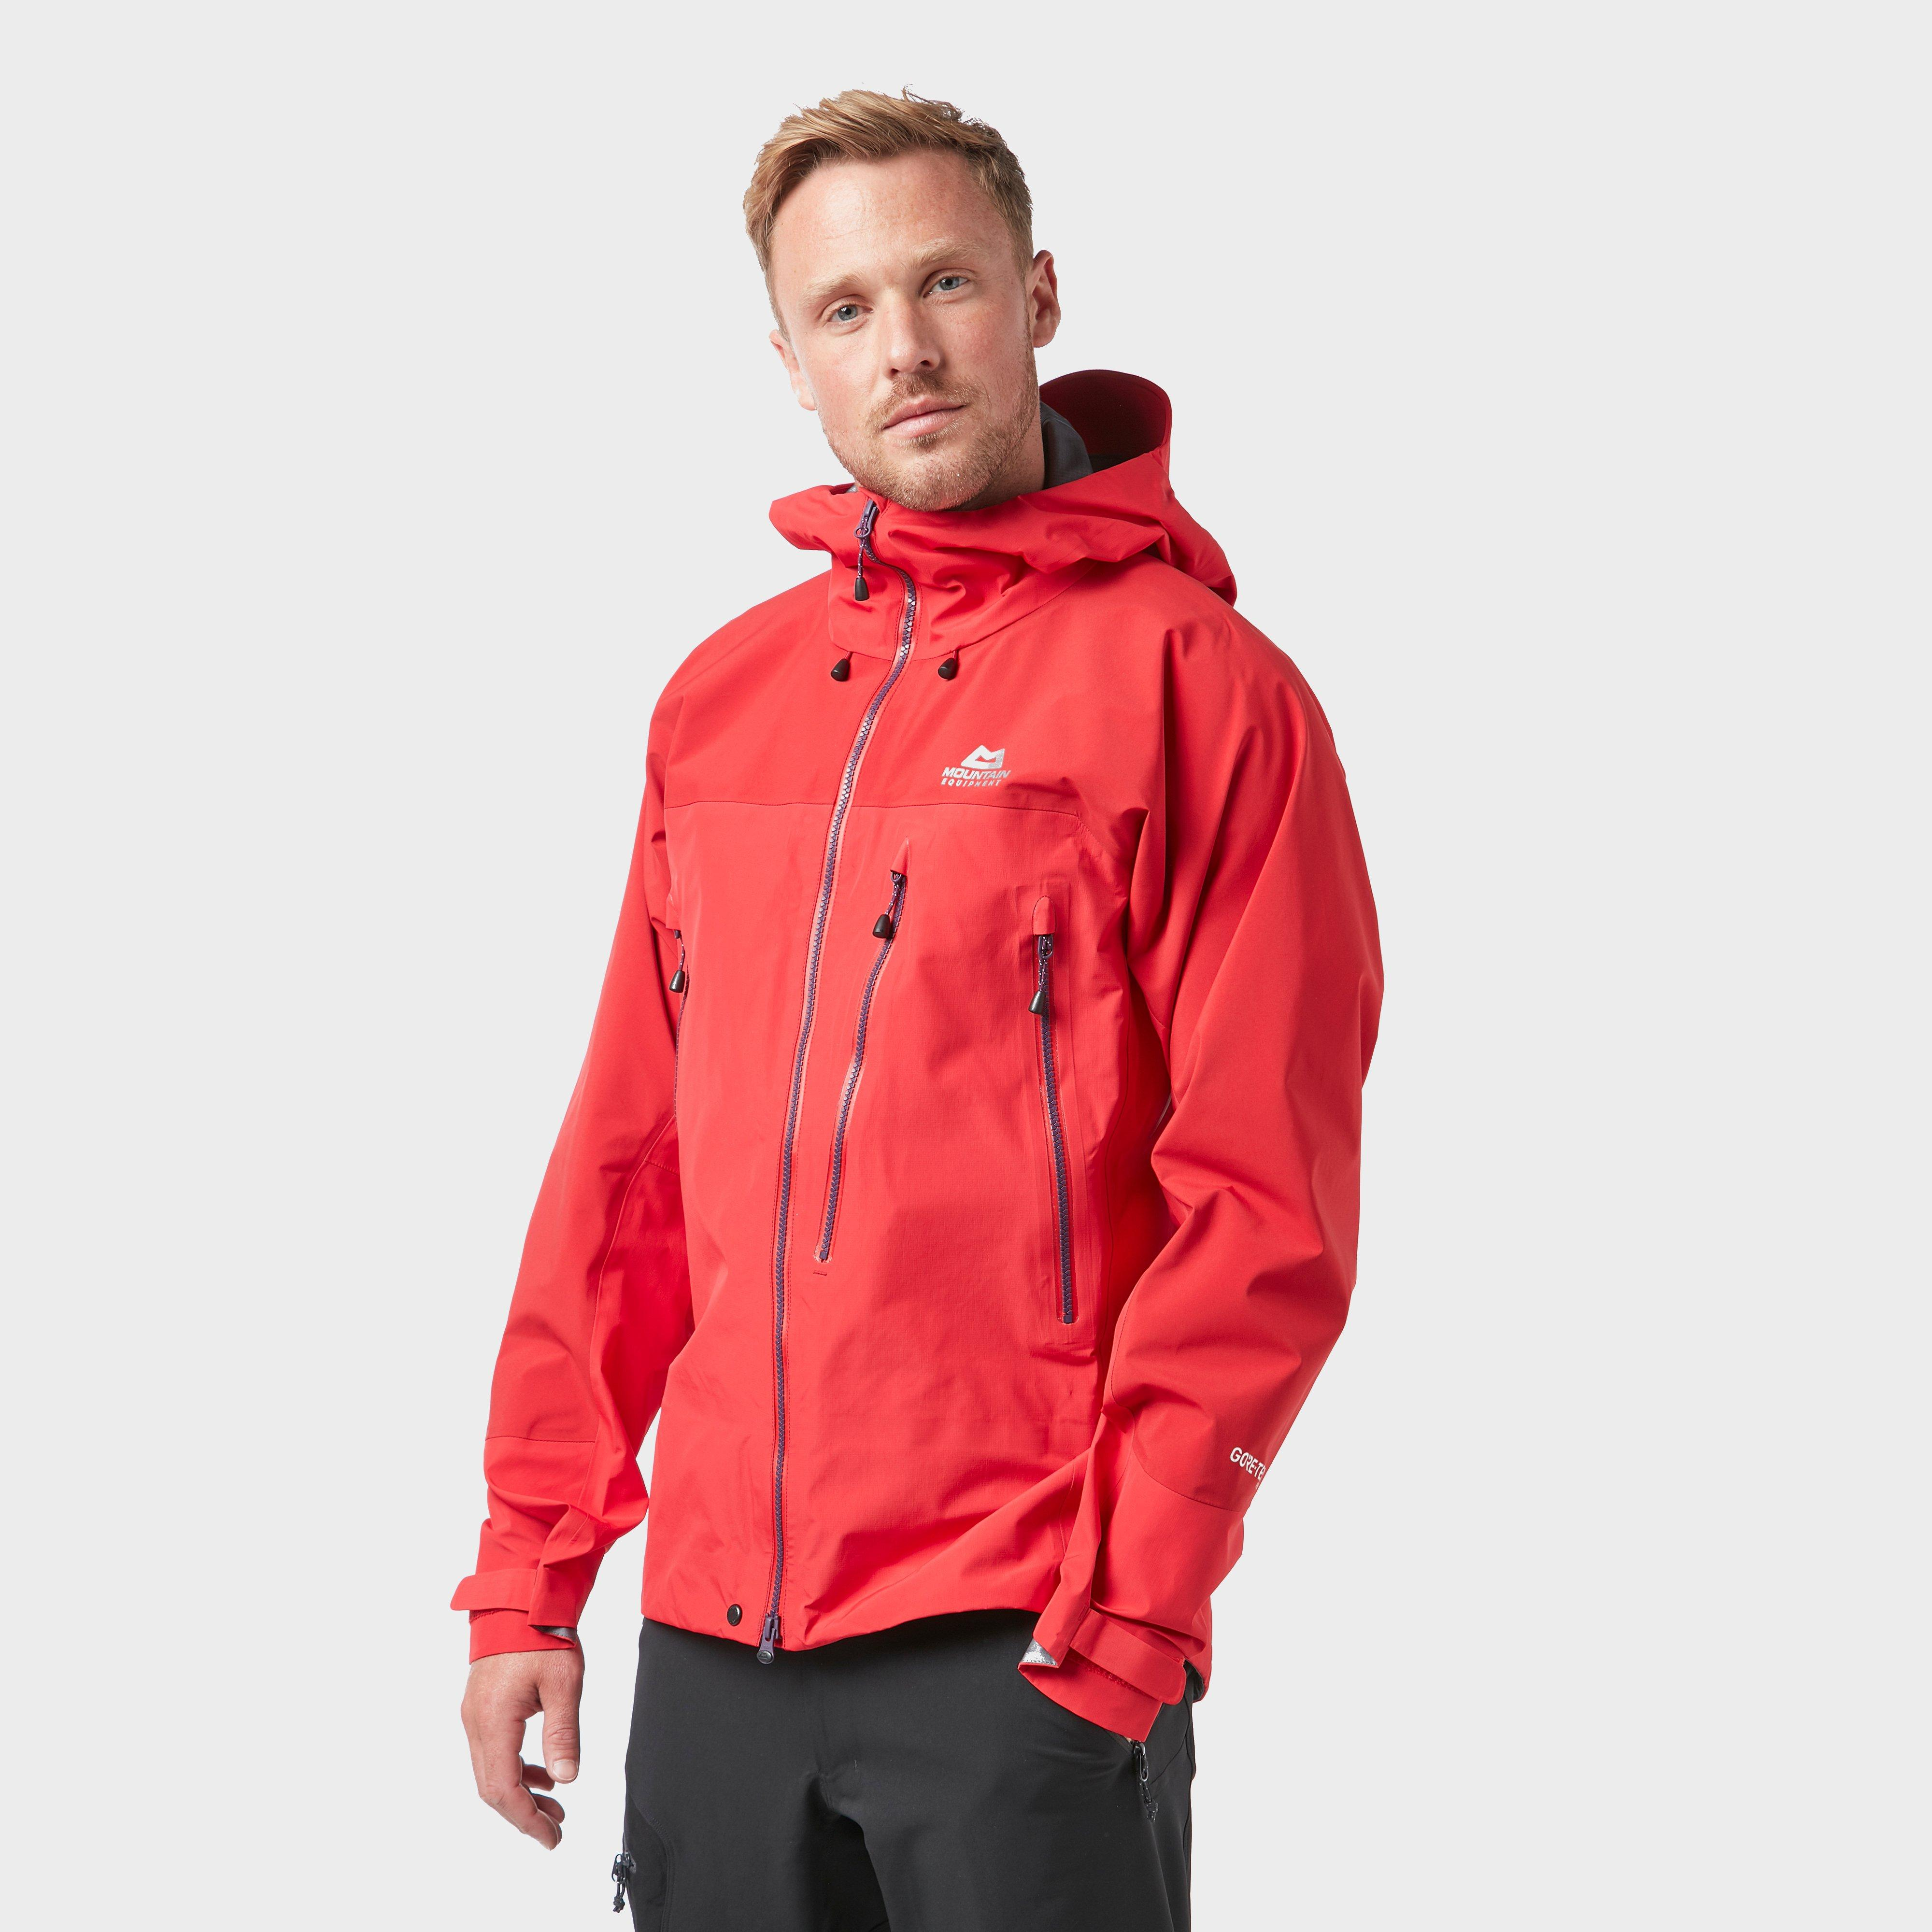 Mountain Equipment Mountain Equipment Mens Lhotse GORE-TEX Jacket - Red, Red